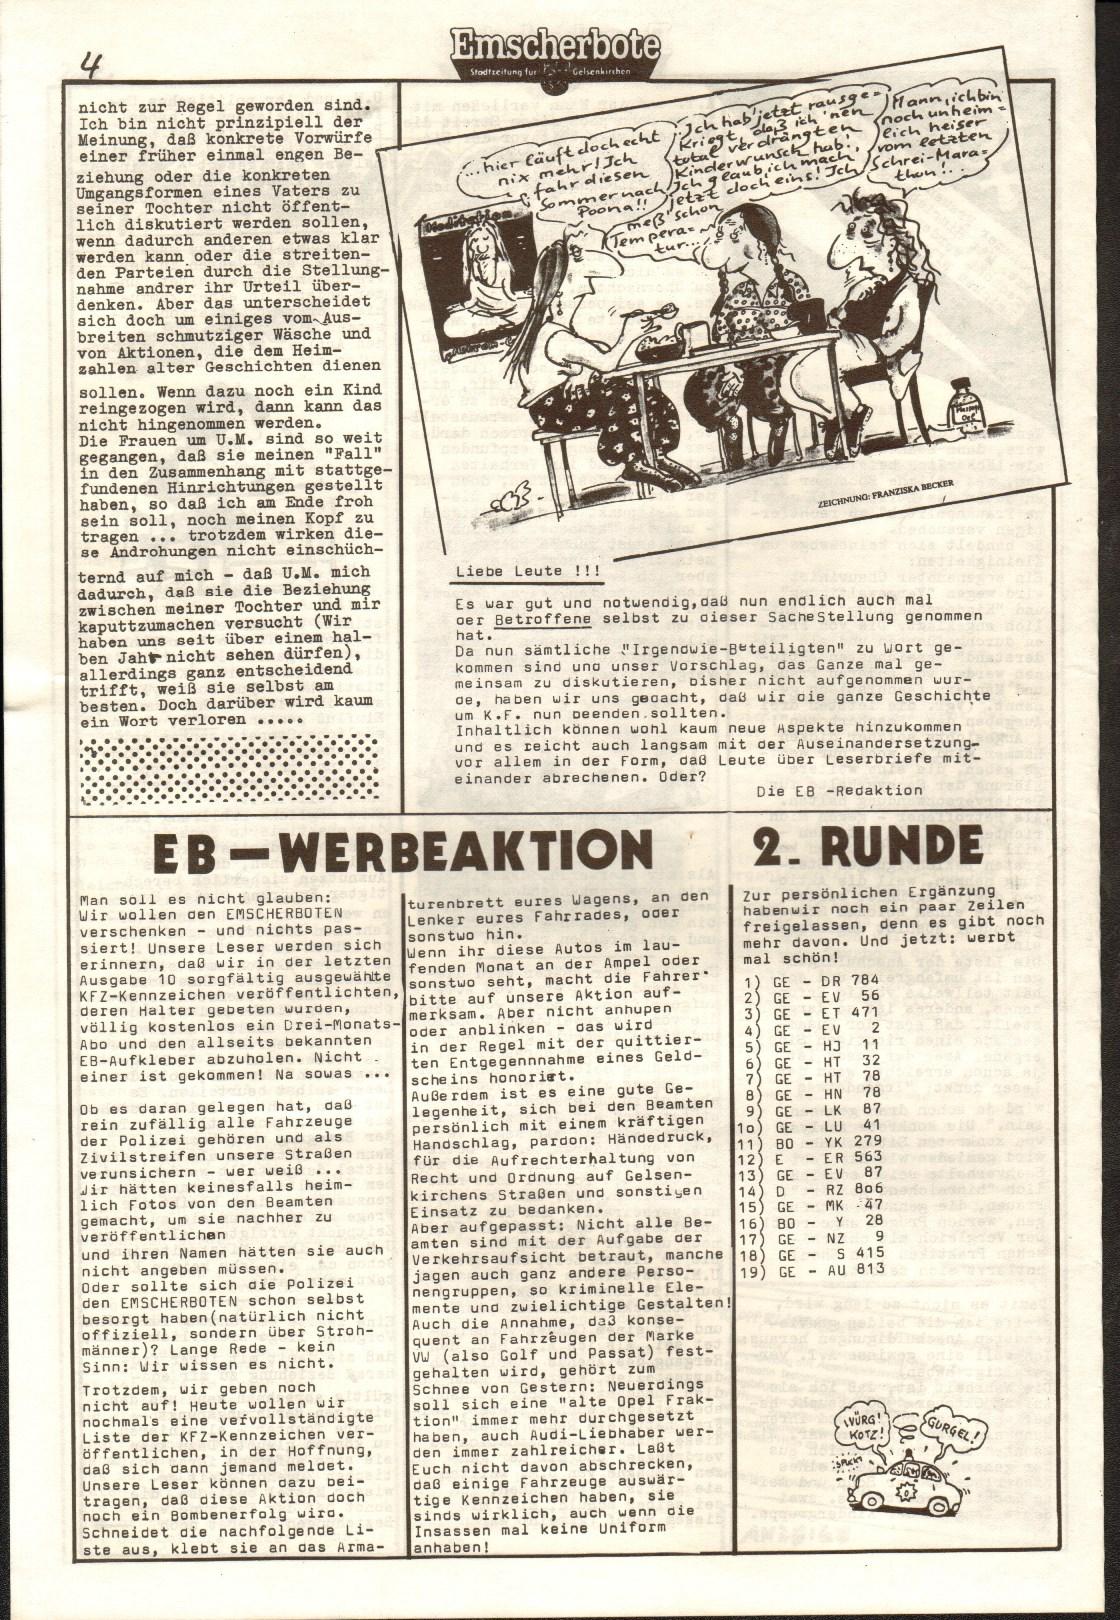 Gelsenkirchen_Emscherbote_1982_18_04